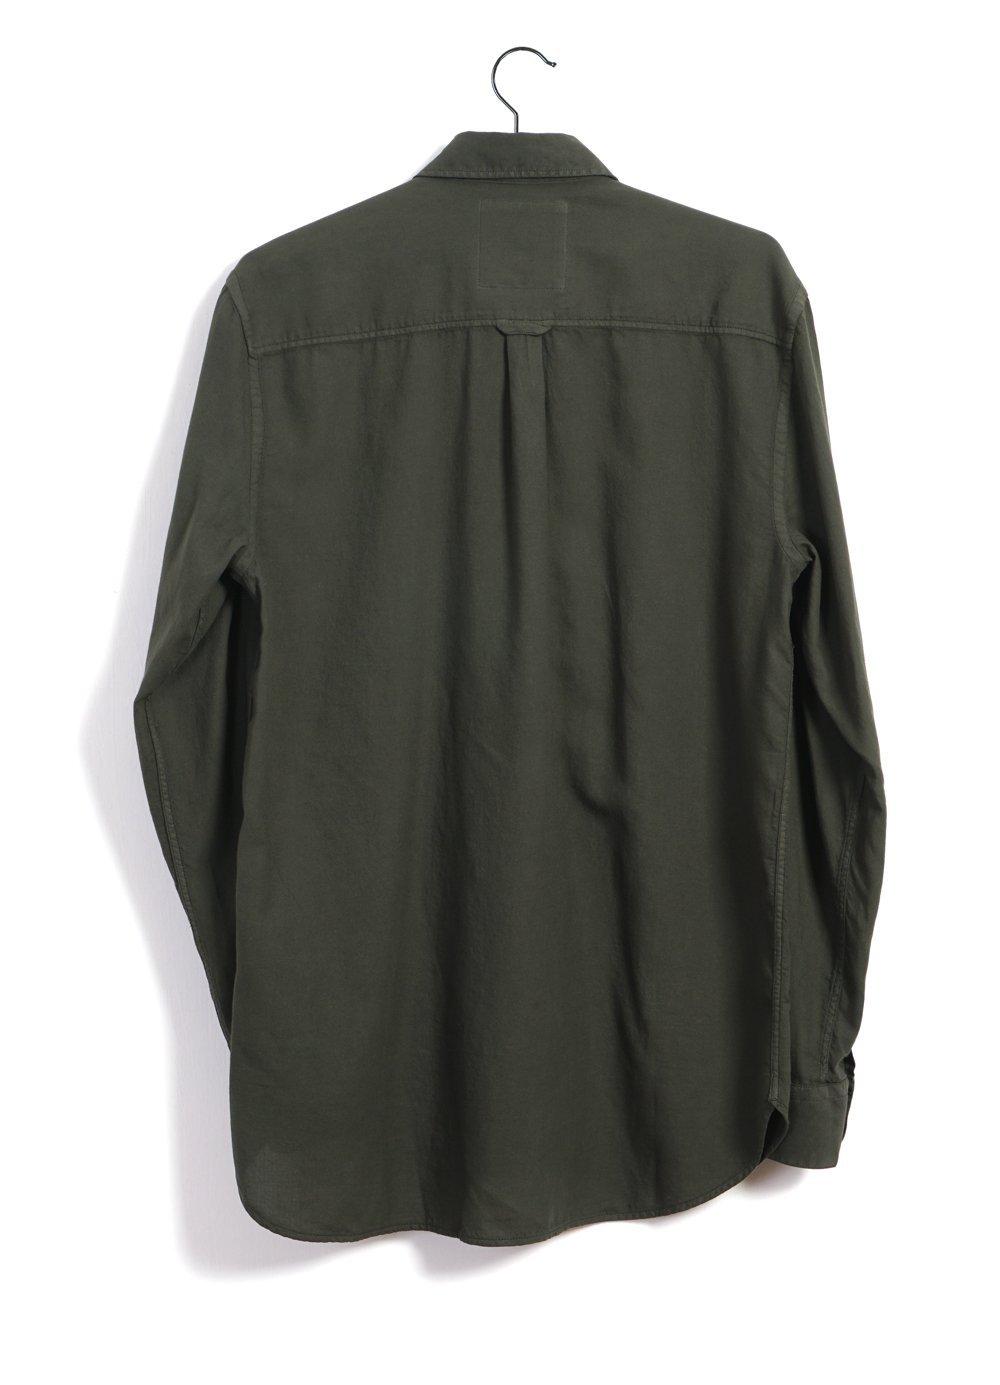 Hansen Garments HENNING   Casual Classic Shirt   white, shark, bottle